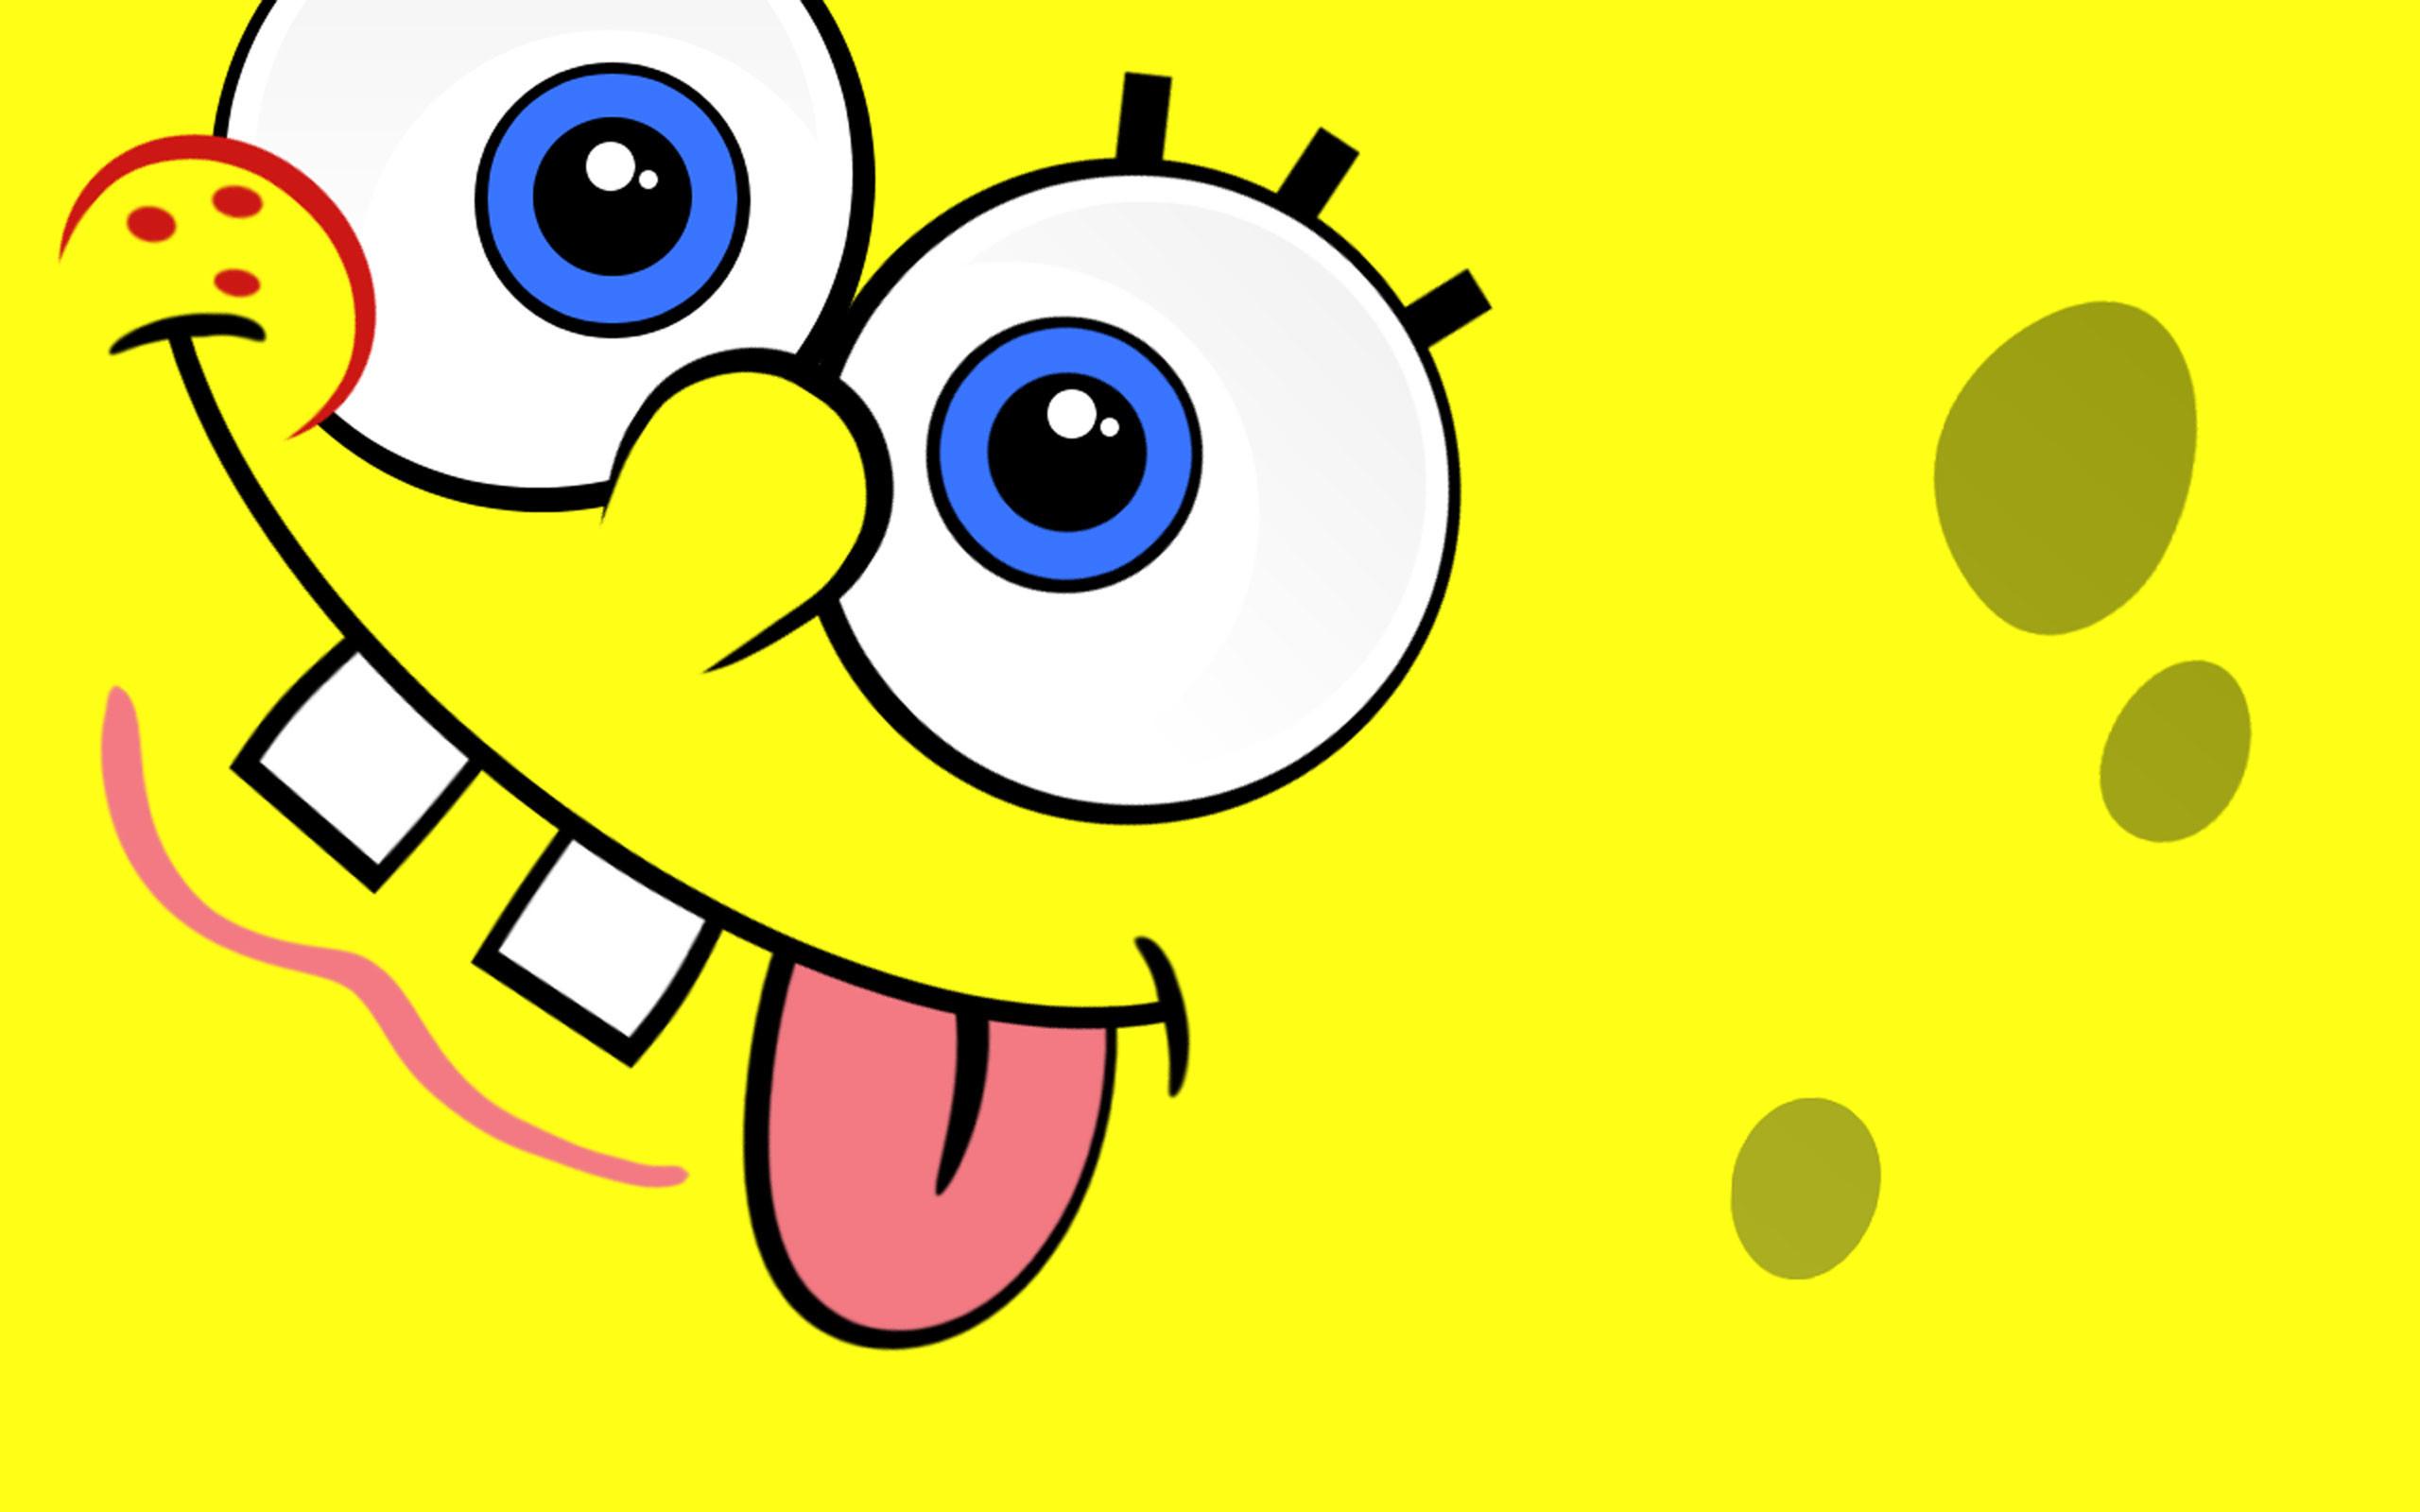 Res: 2560x1600, Free Spongebob Squarepants Funny, computer desktop wallpapers, pictures,  images